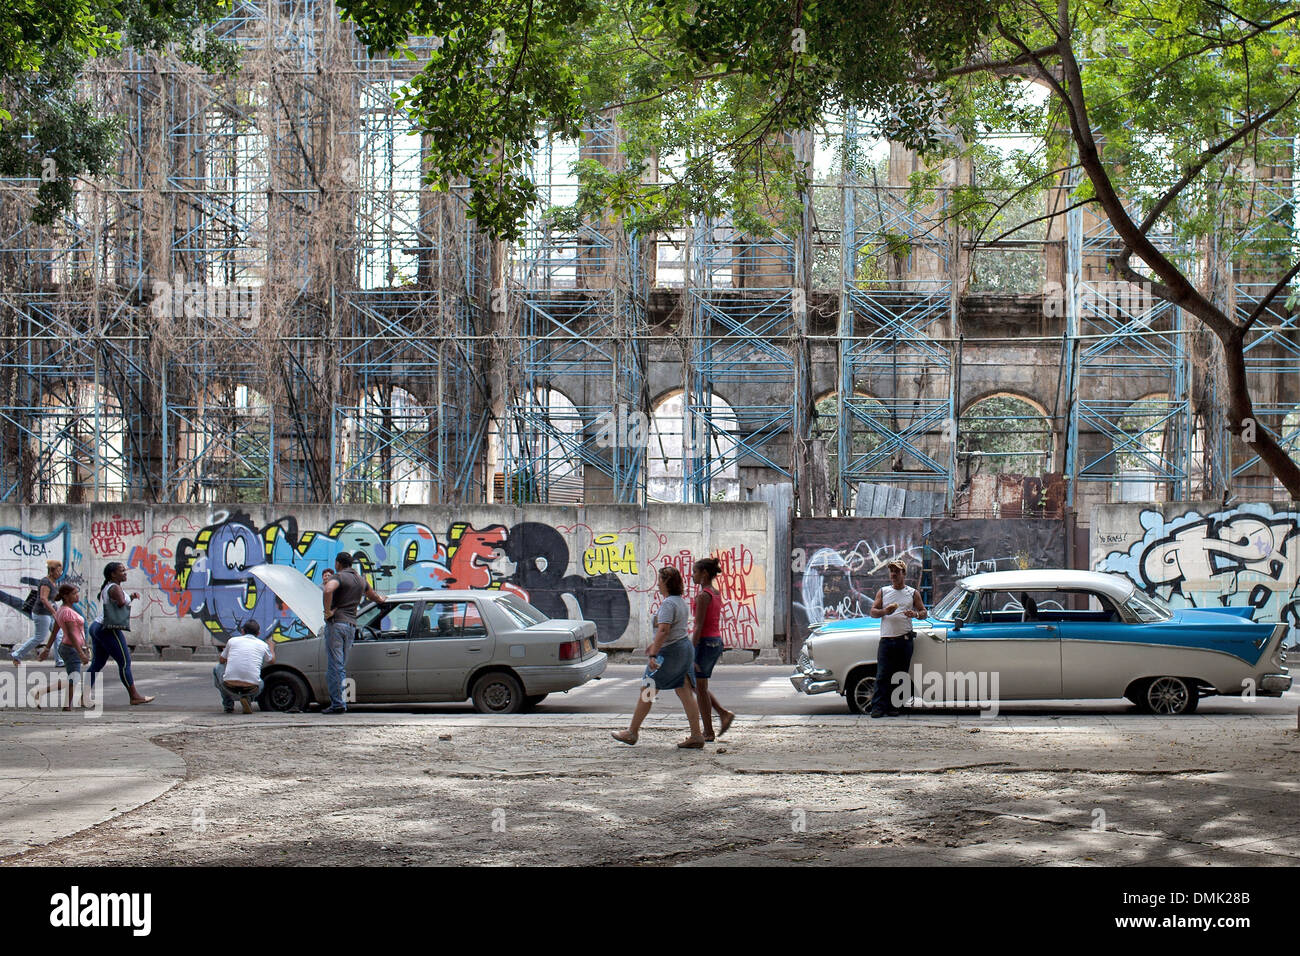 REPAIR OF OLD AMERICAN CARS, STREET SCENE, DAILY LIFE, CALLE TENIENTE REY, HAVANA, CUBA, THE CARIBBEAN - Stock Image